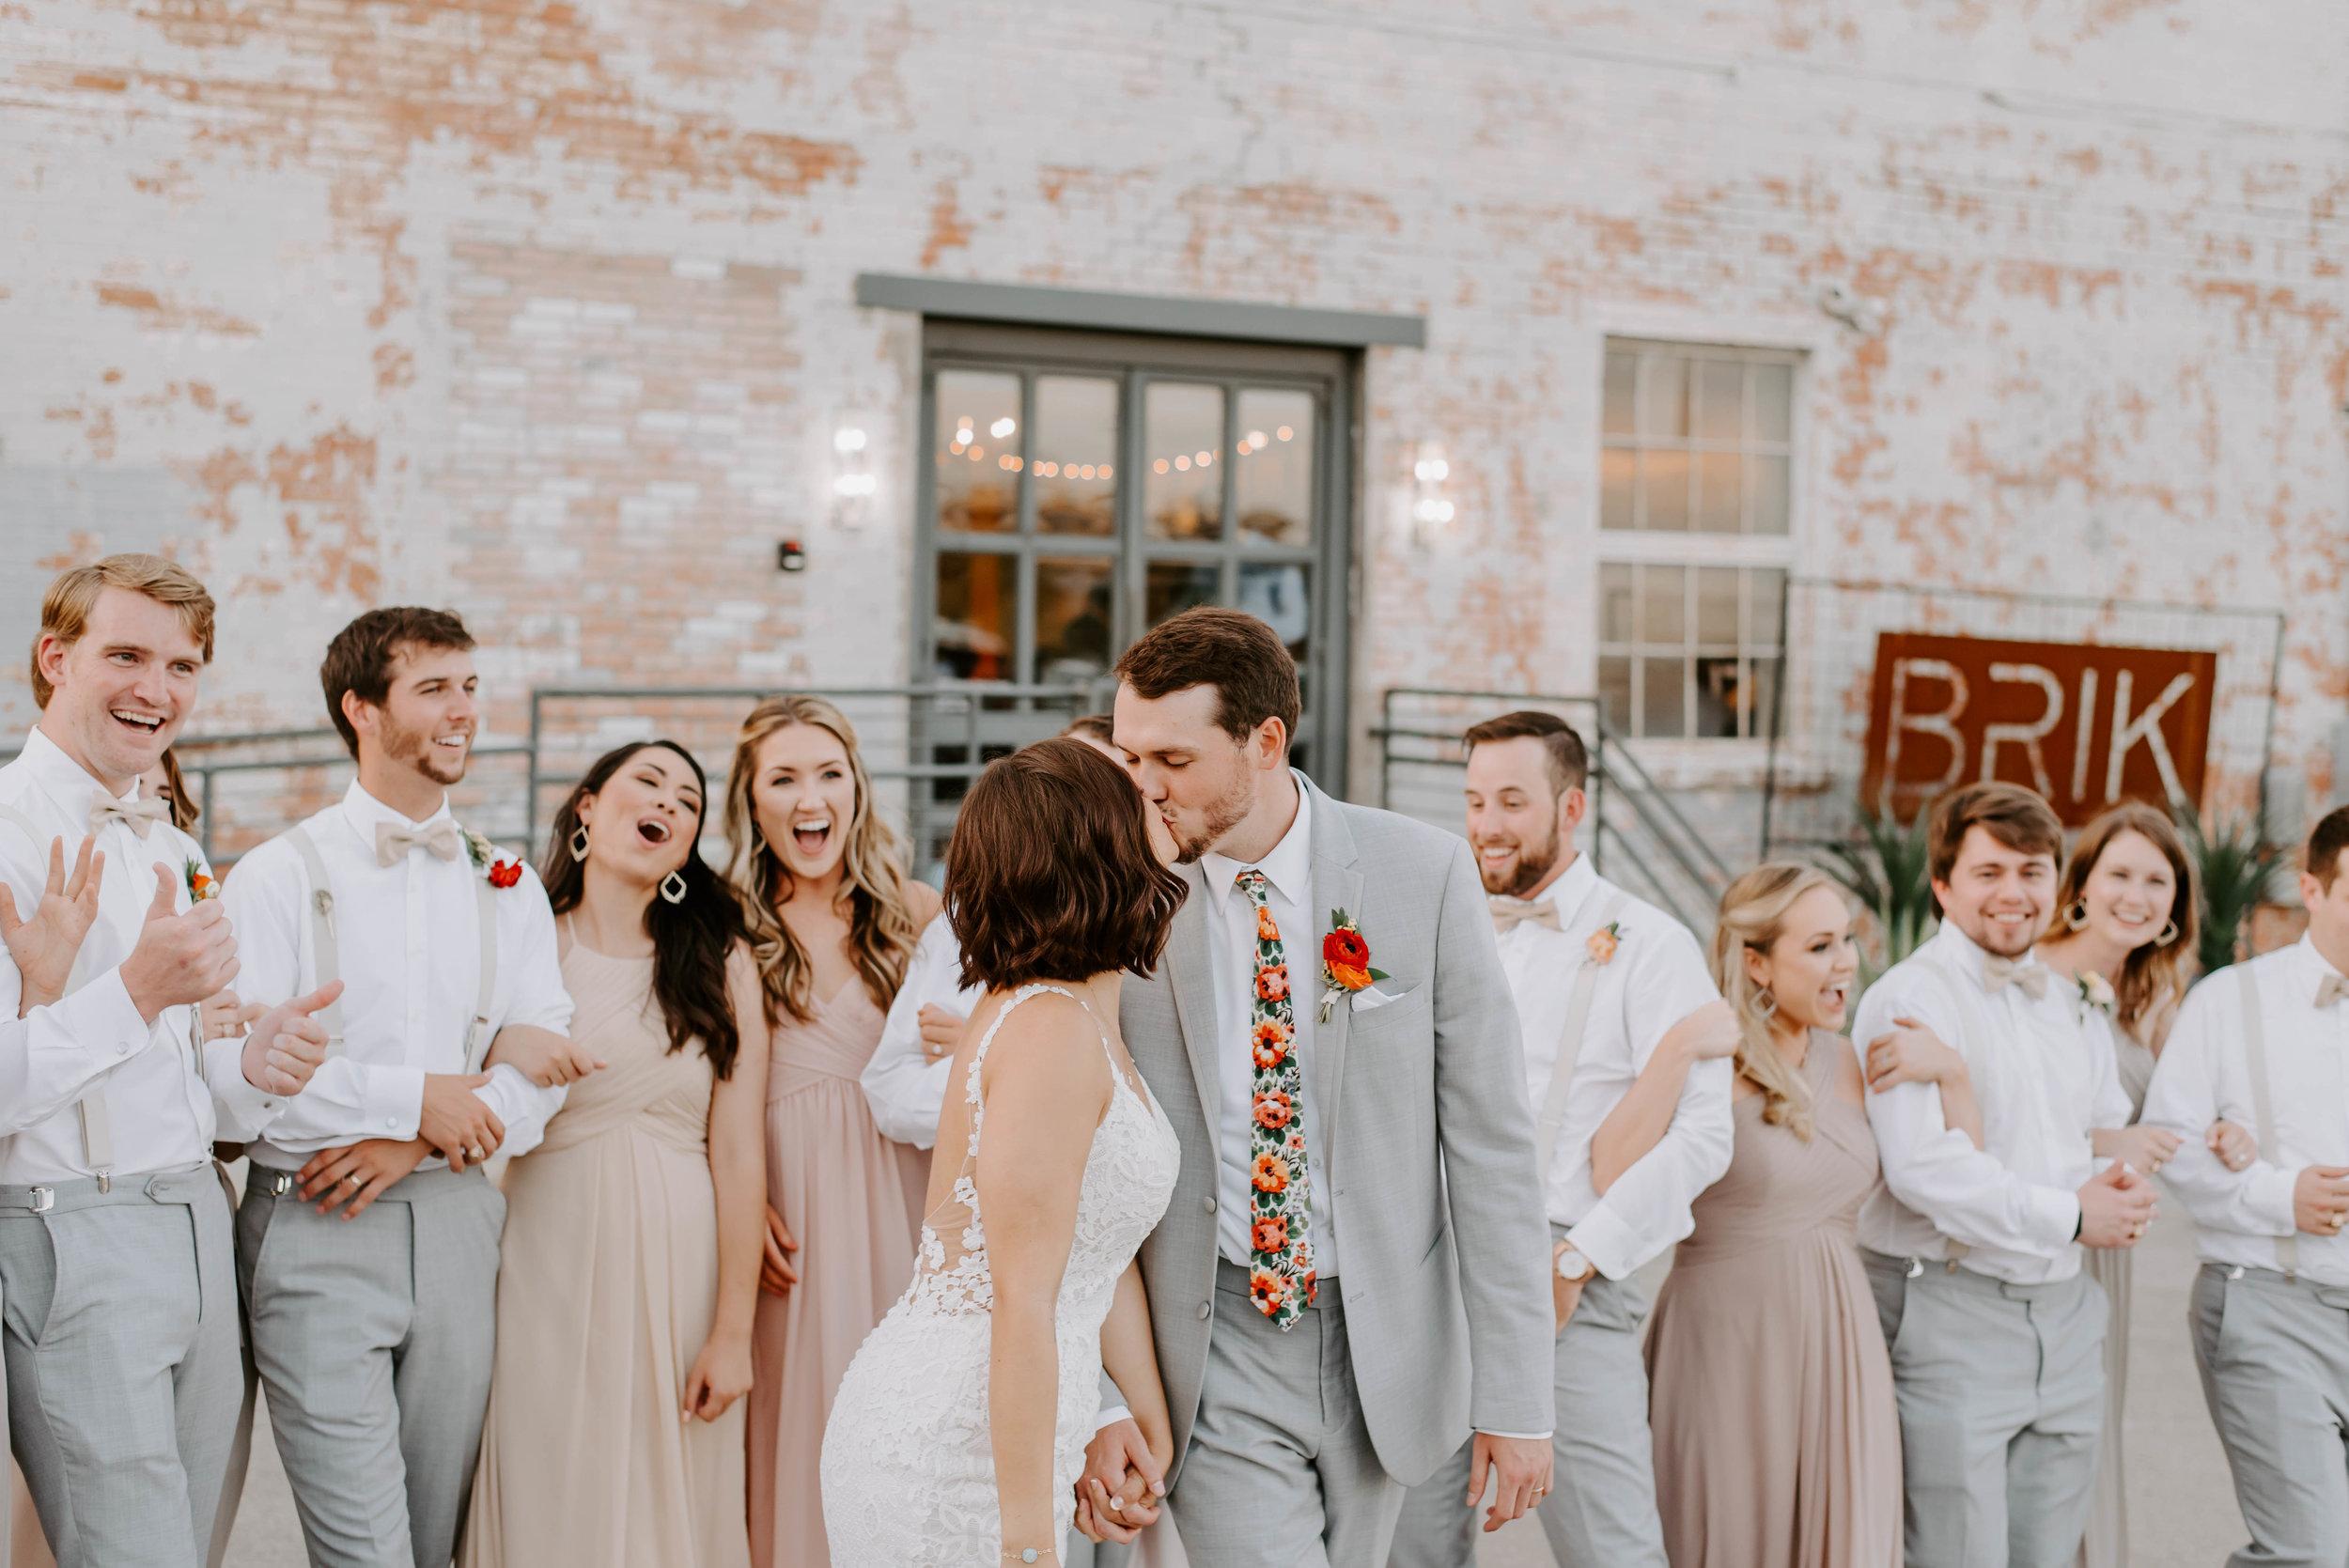 Brik Venue Fort Worth Summer Wedding-7115.jpg